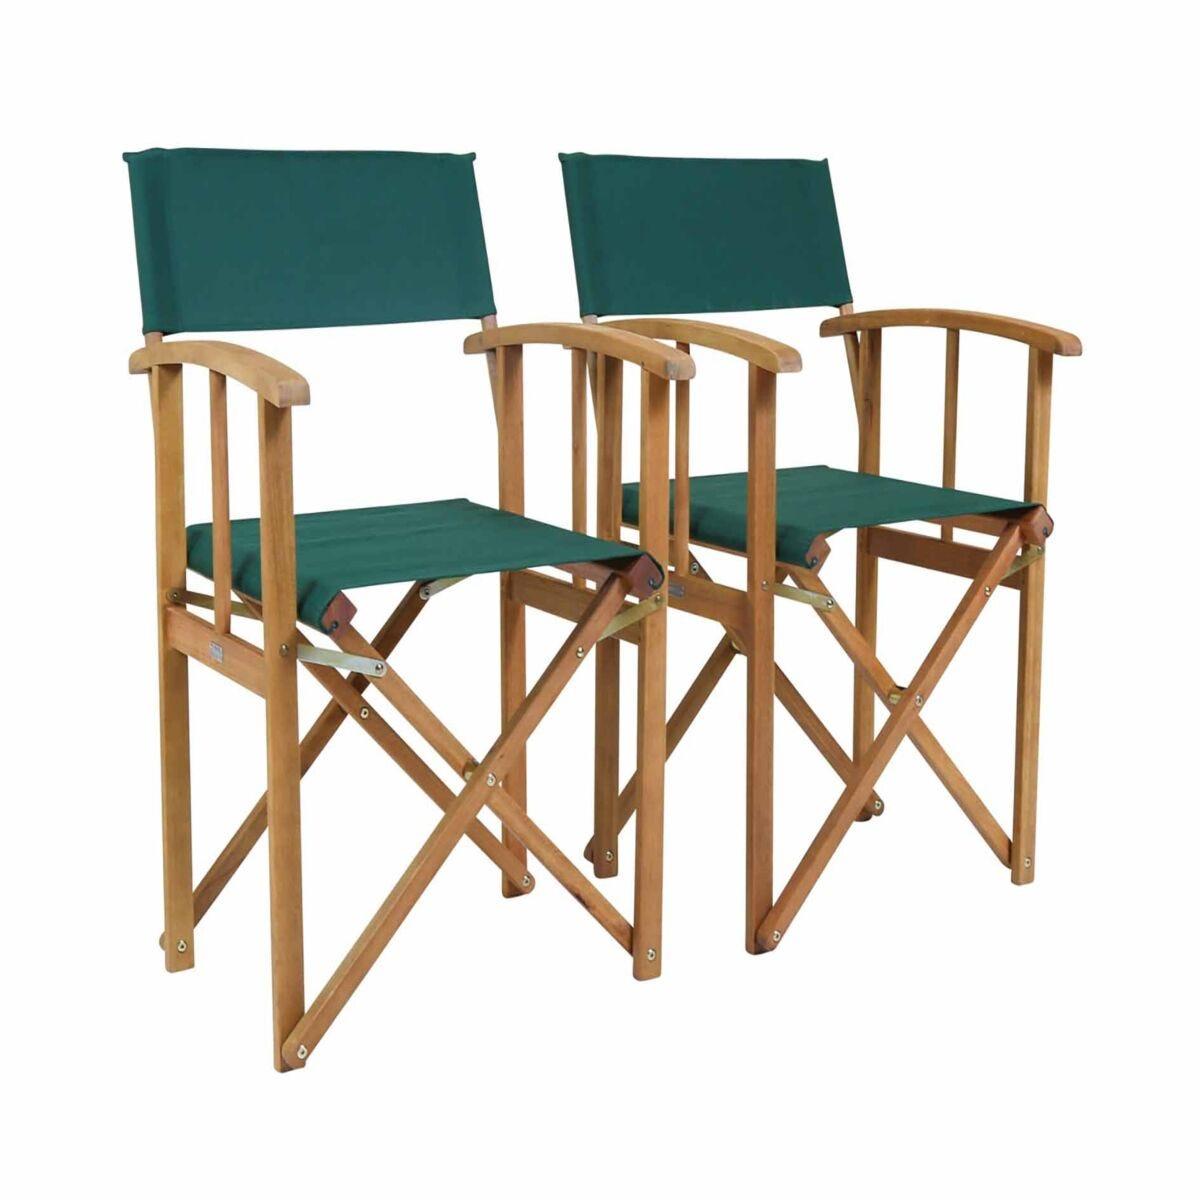 Charles Bentley Folding Garden Chair Set of 2